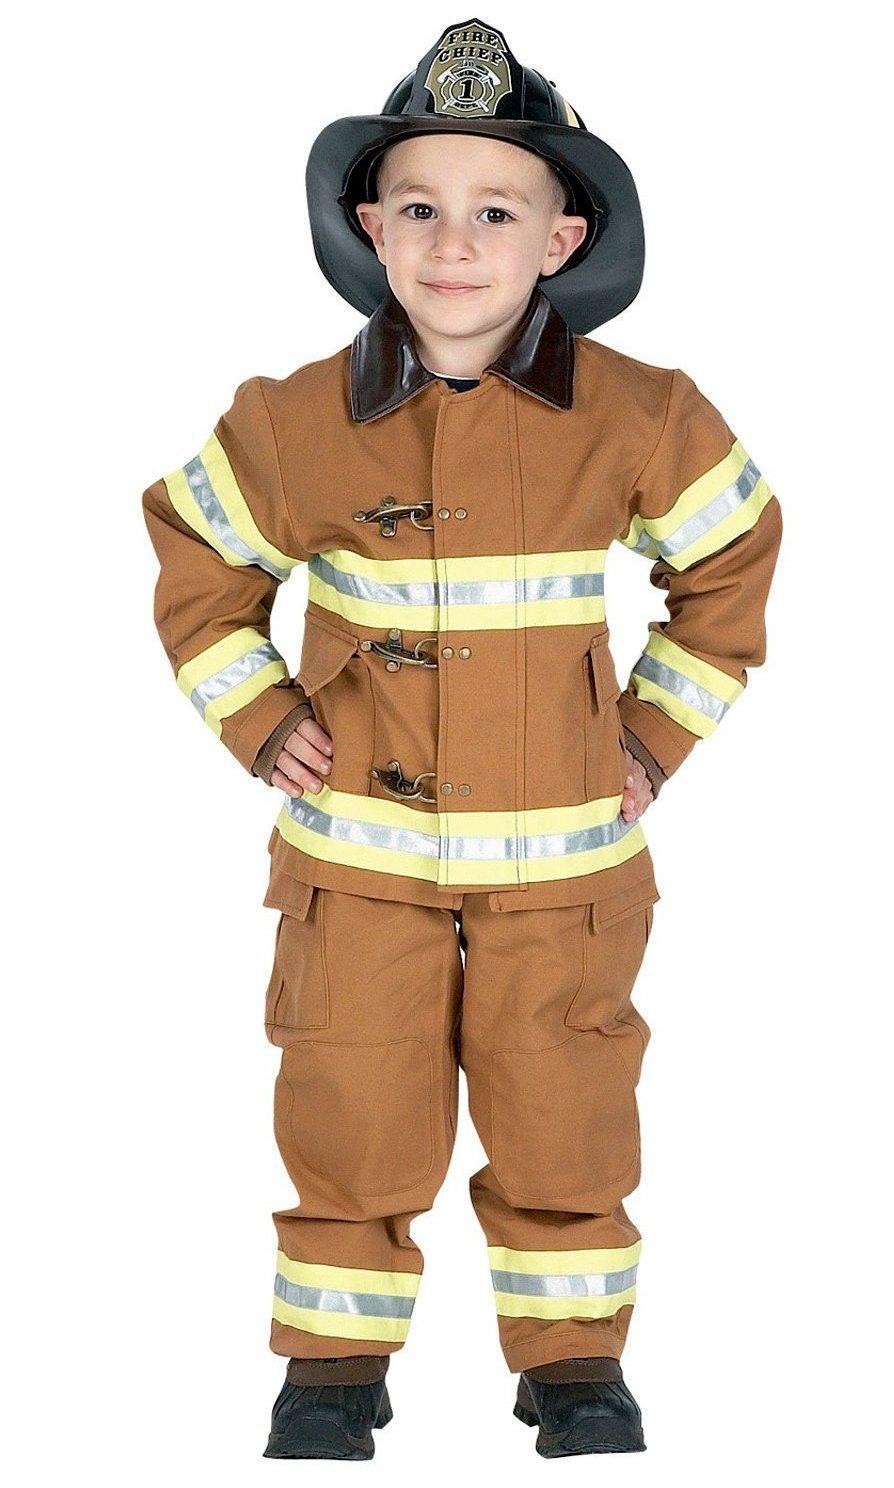 Jr FIRE FIGHTER Fireman suit kids boys halloween costume